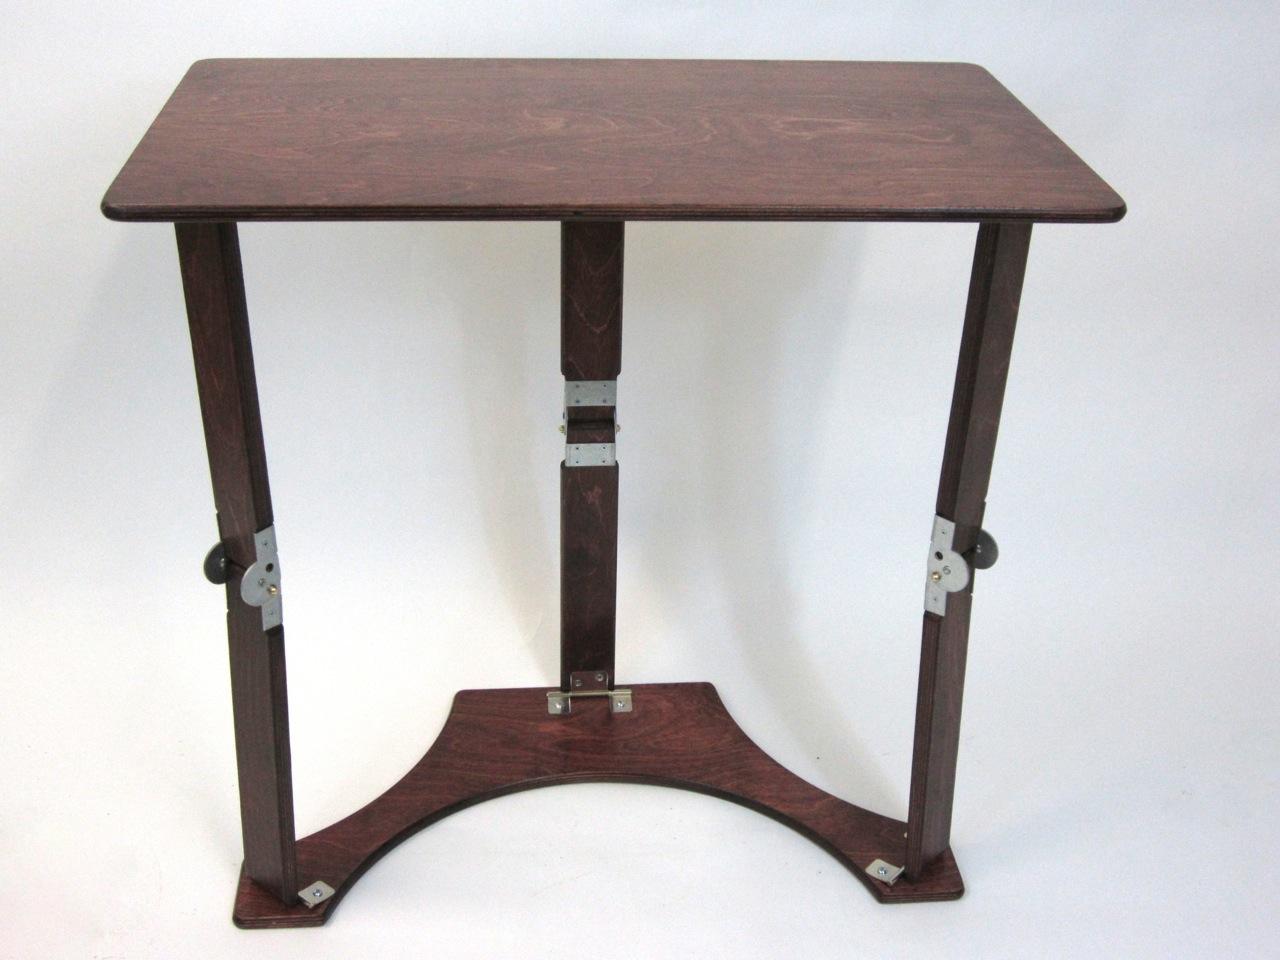 Spiderlegs LD1527-M  Small Folding Laptop Desk-Tray Table - Mahogany